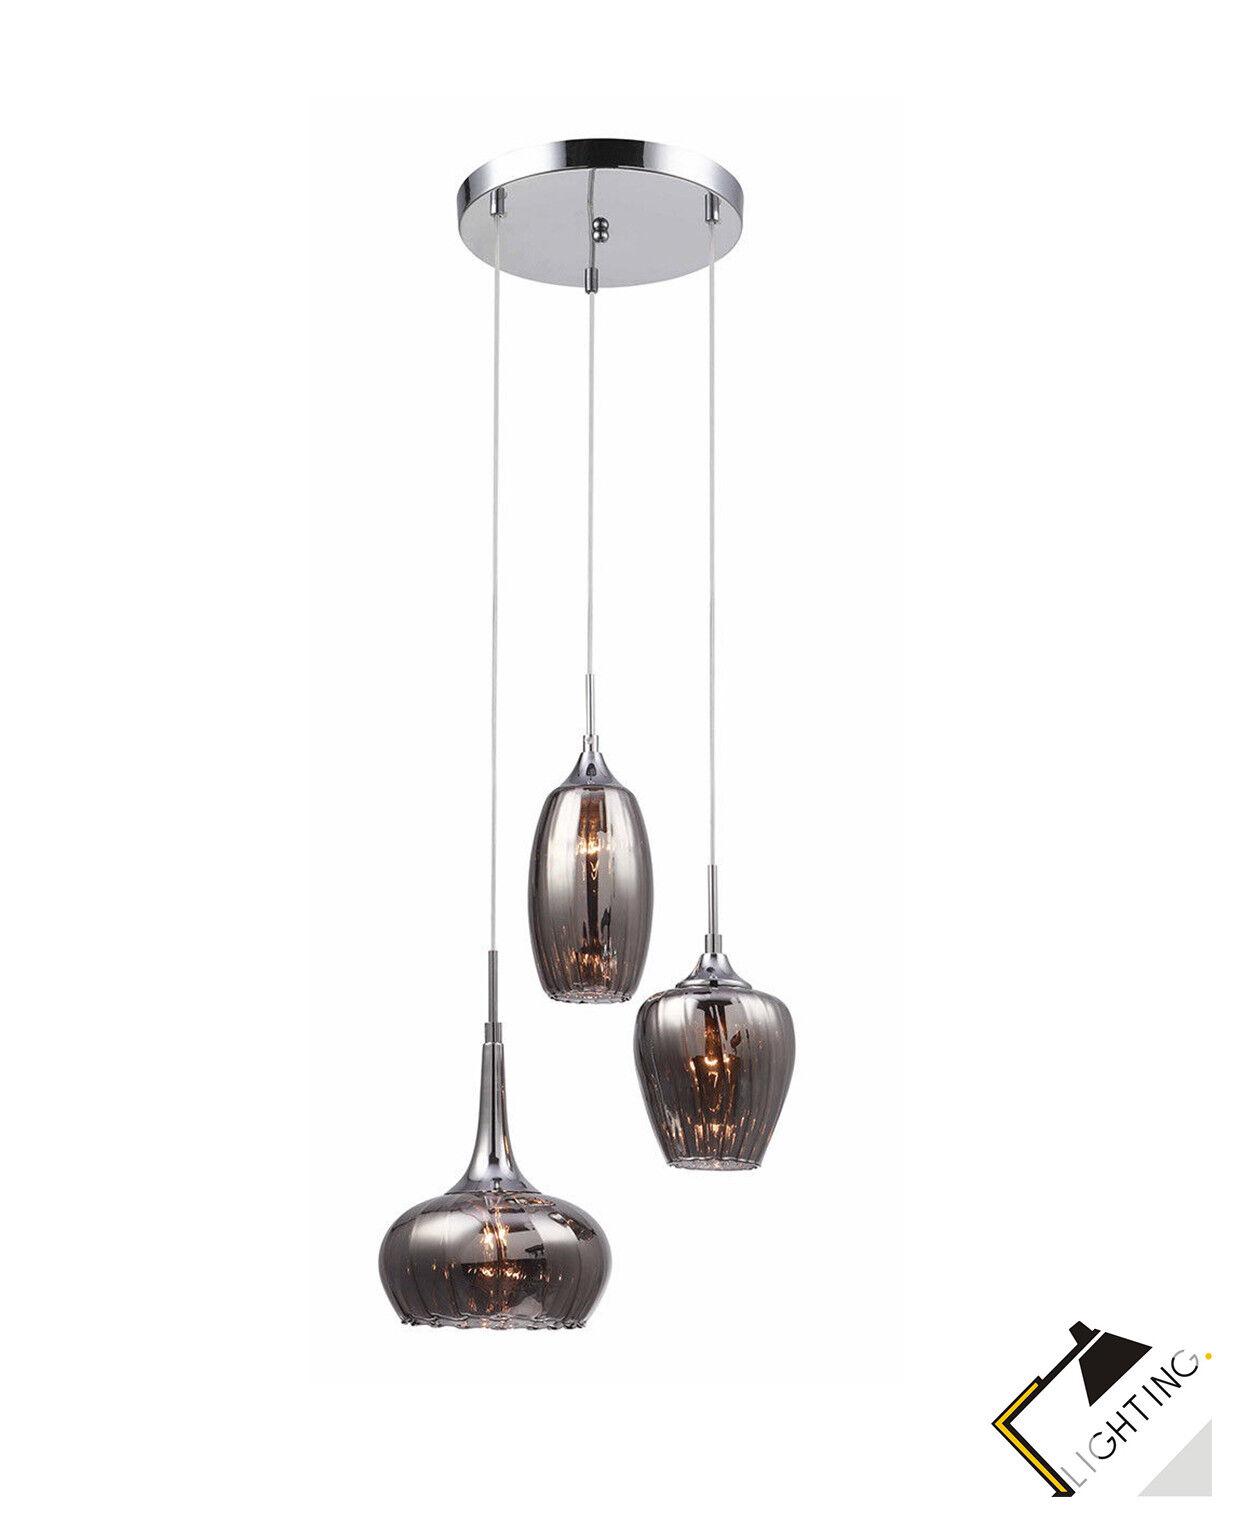 Luminaire Suspendu 3-flammige Lampe Chrome Chrome Lampe / Métal Smoky Verre H100cm Led c4bfe6